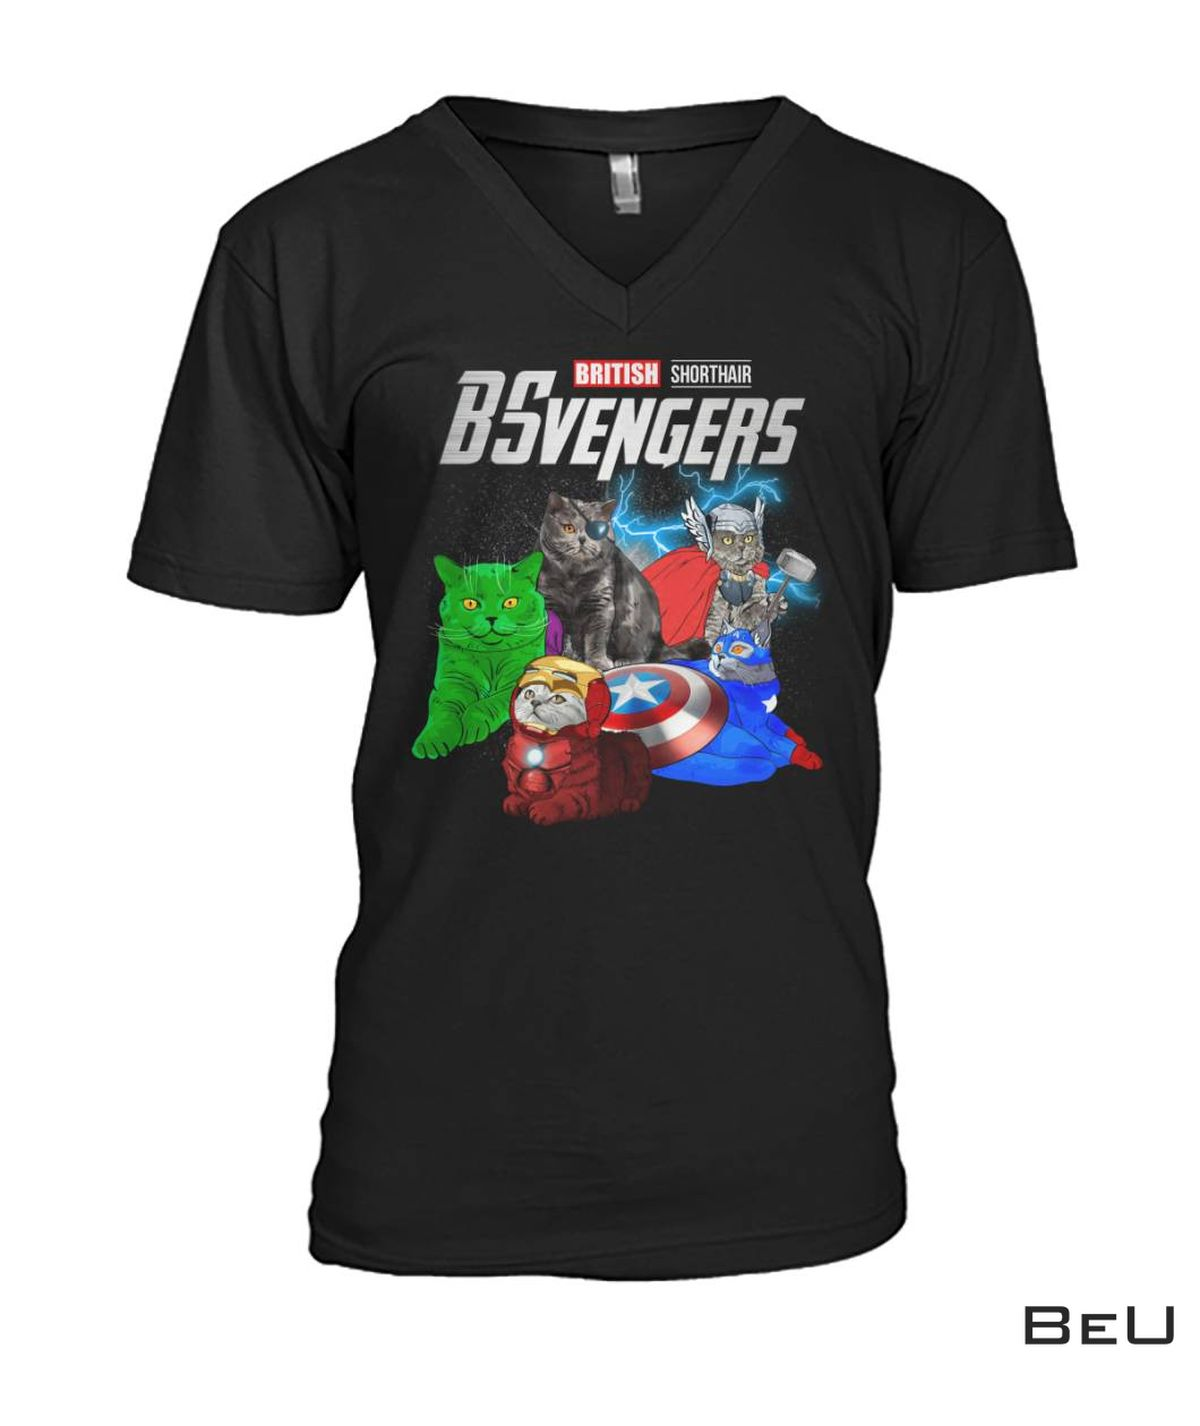 BSvengers British Shorthair Cat Avengers Shirt, hoodie, tank top